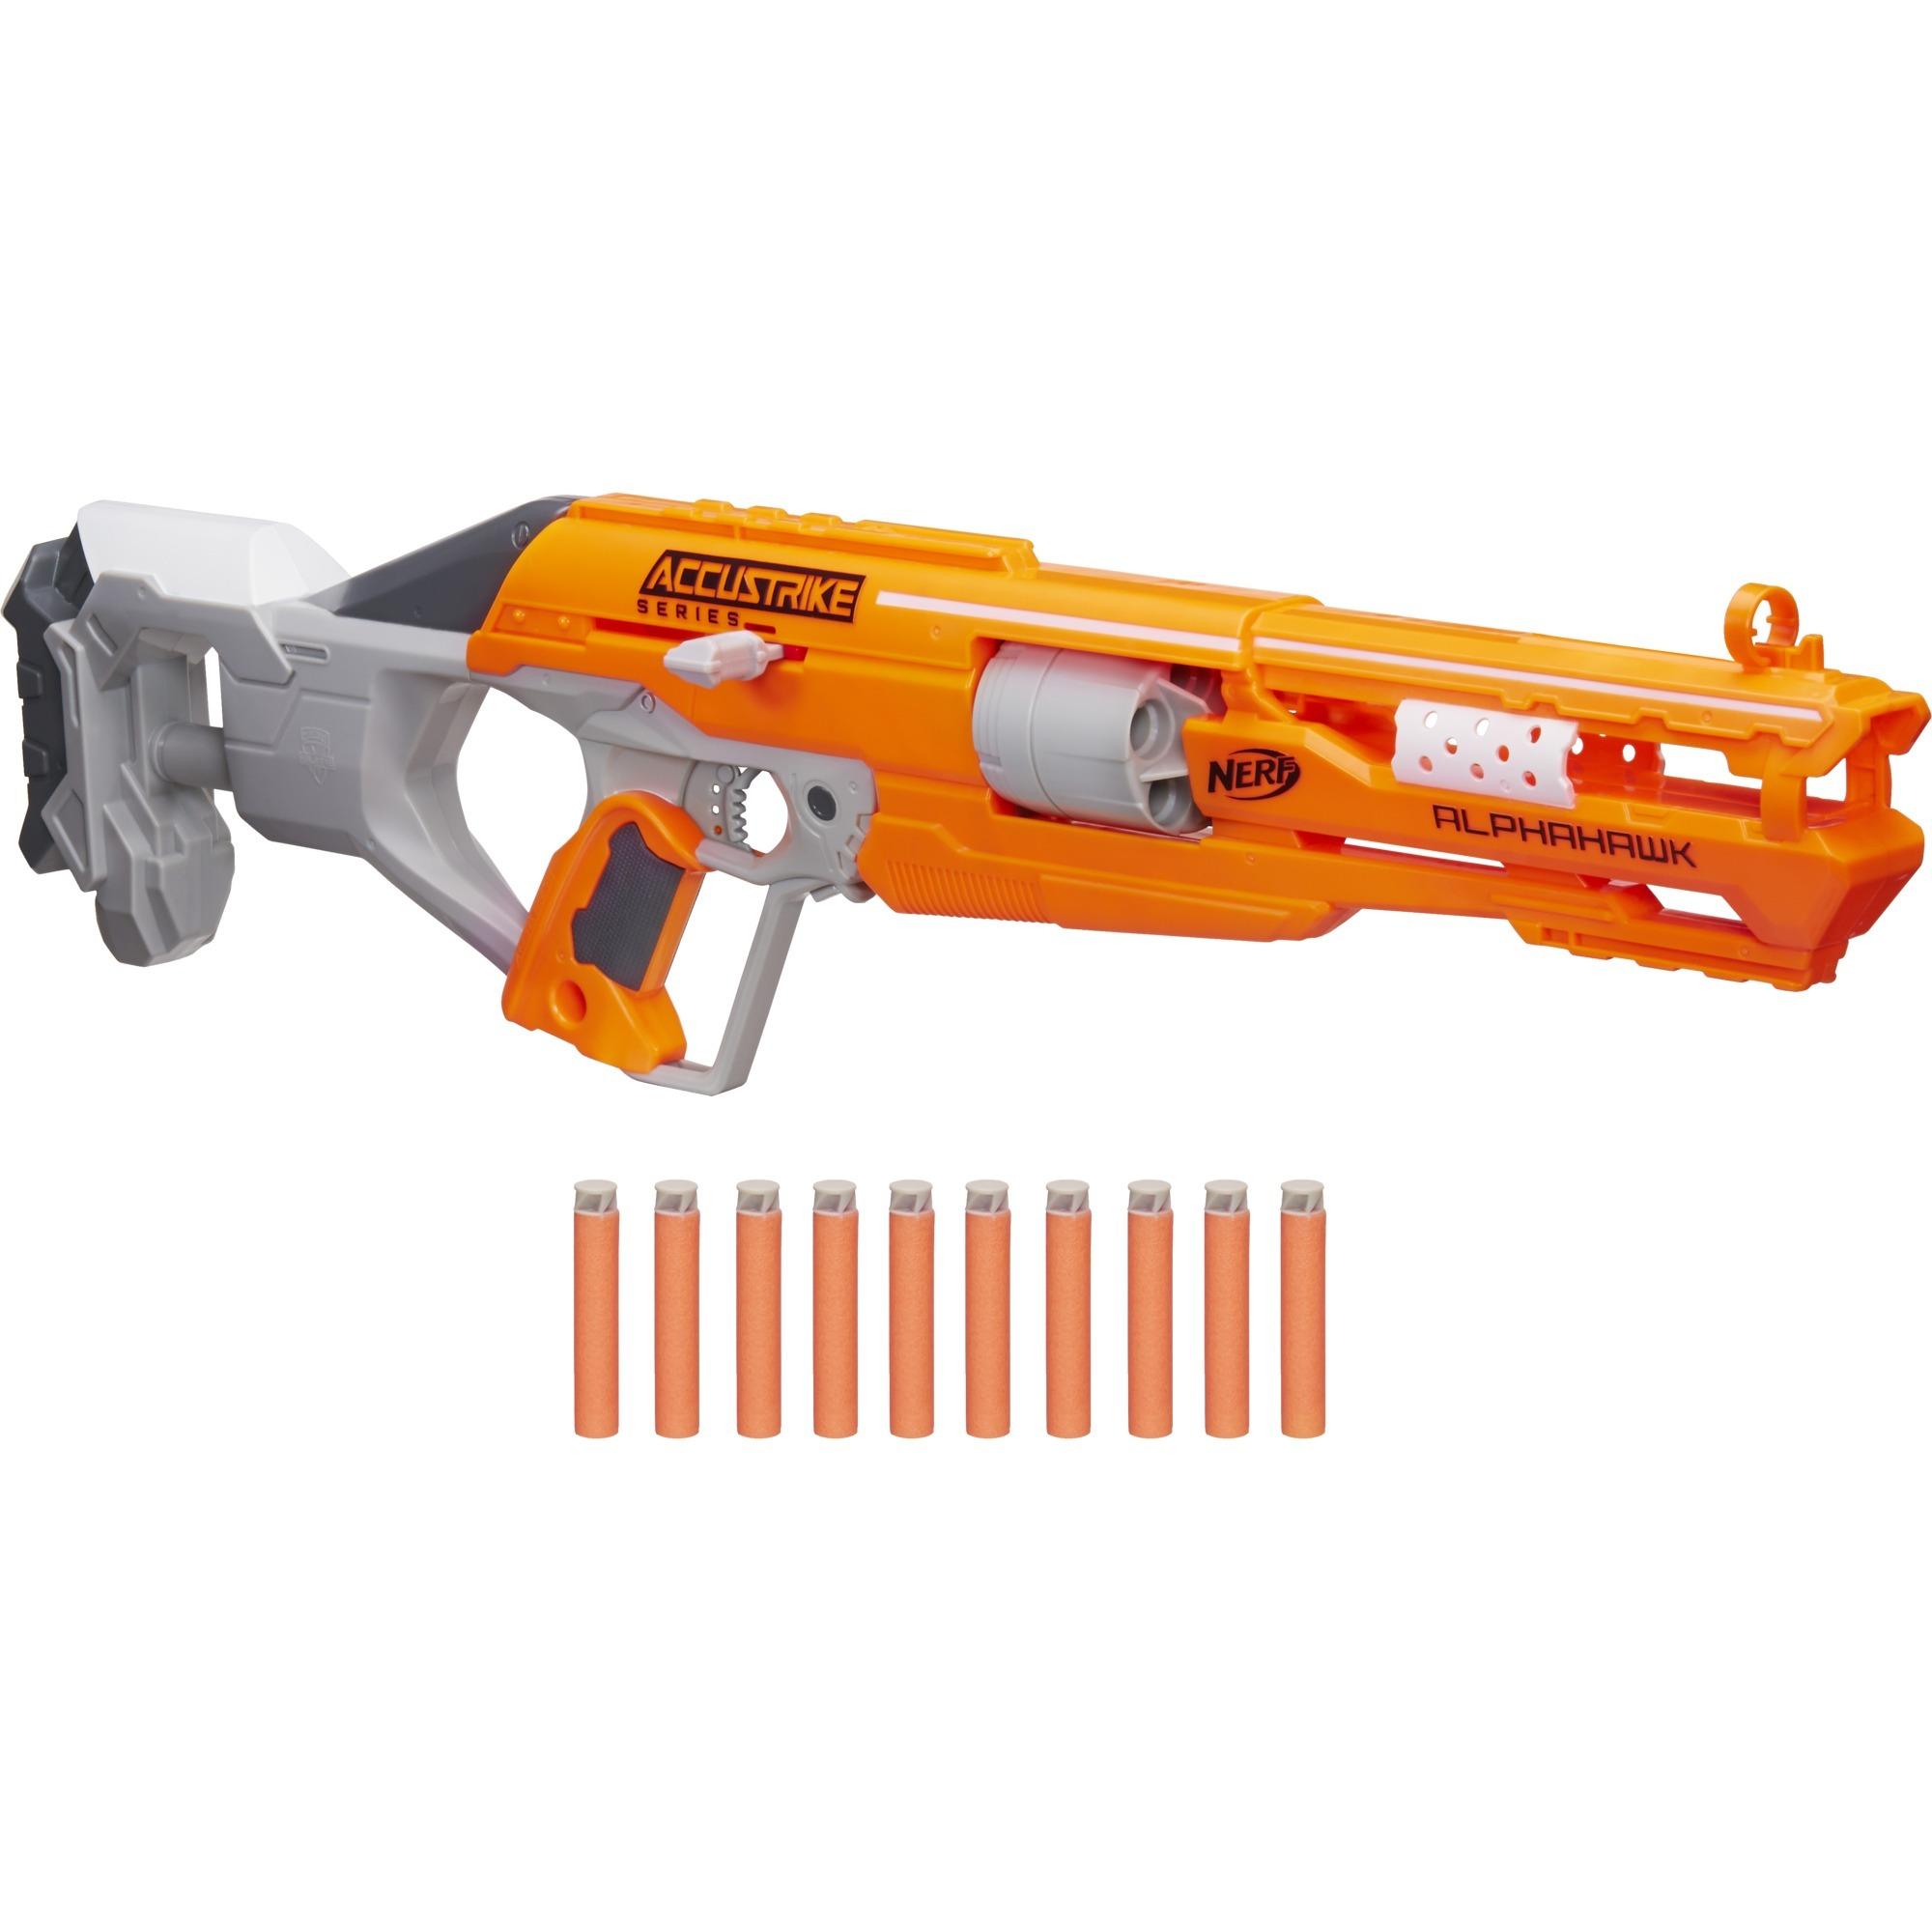 AlphaHawk Armas de juguete, Pistola Nerf